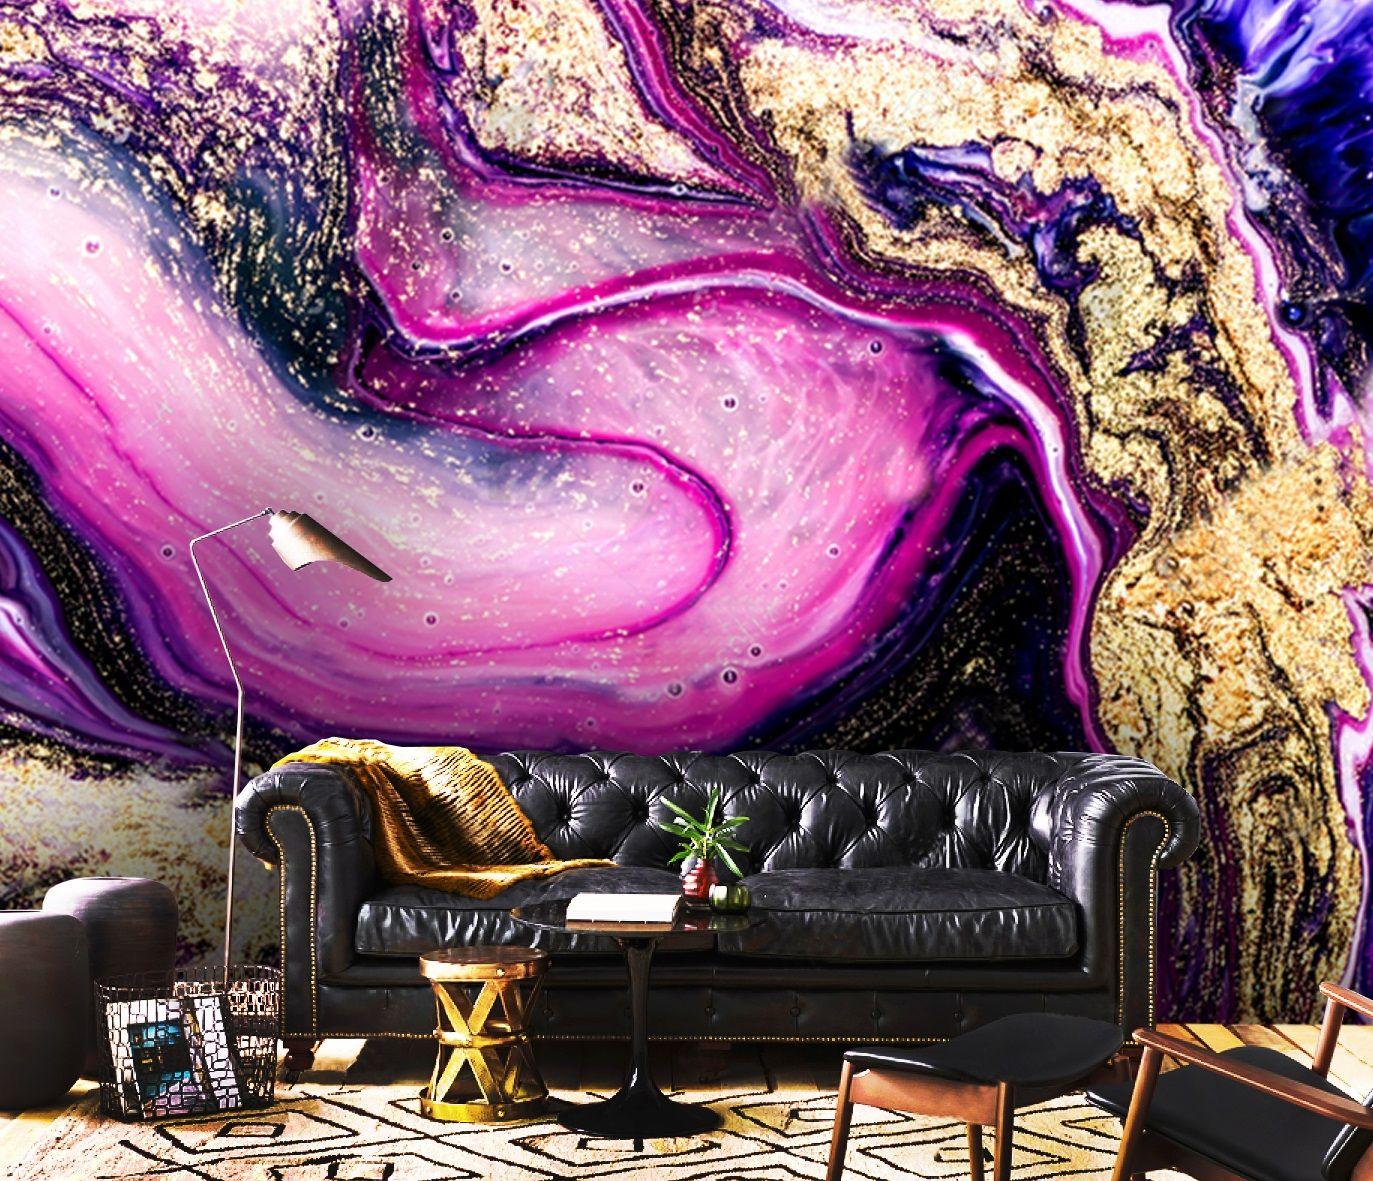 Wallpaperadhesive Vinylpurple Gold Sparklesremovablerose Etsy Vinyl Wallpaper Wallpaper Marble Art